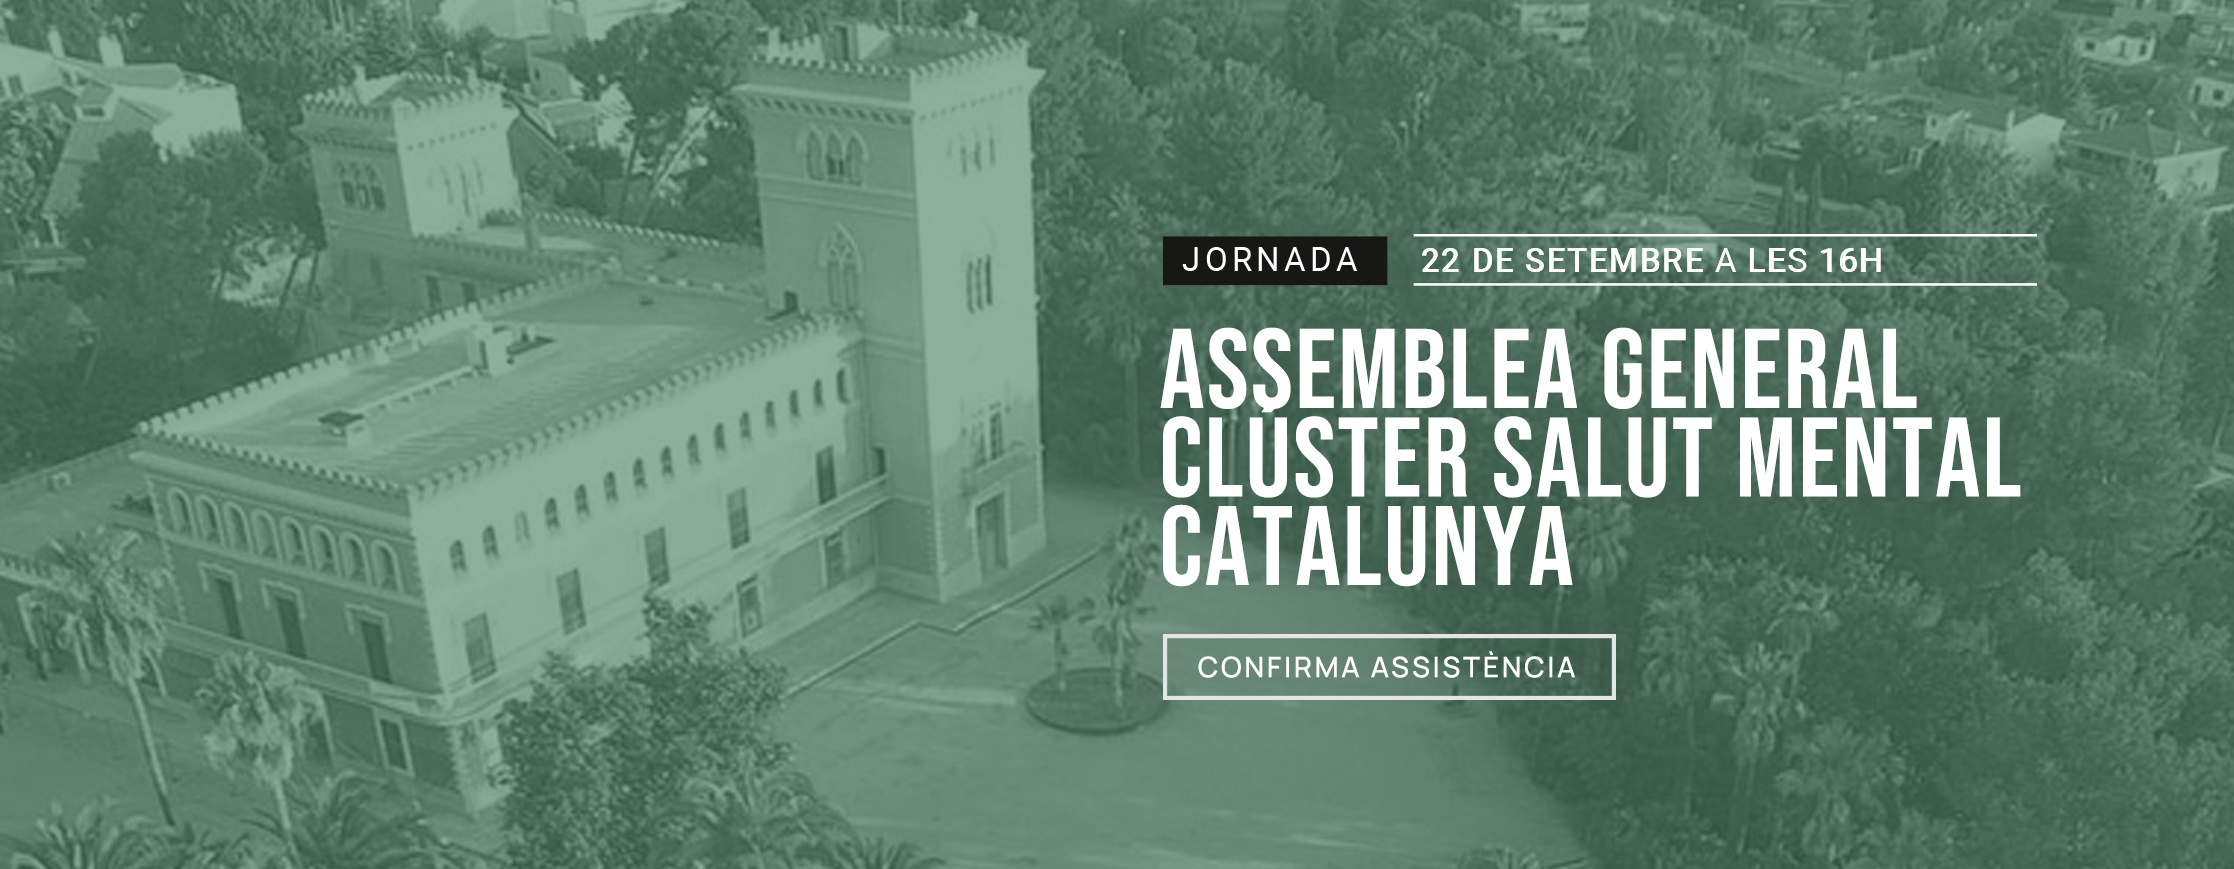 Assemble general CSMC 22 de setembre